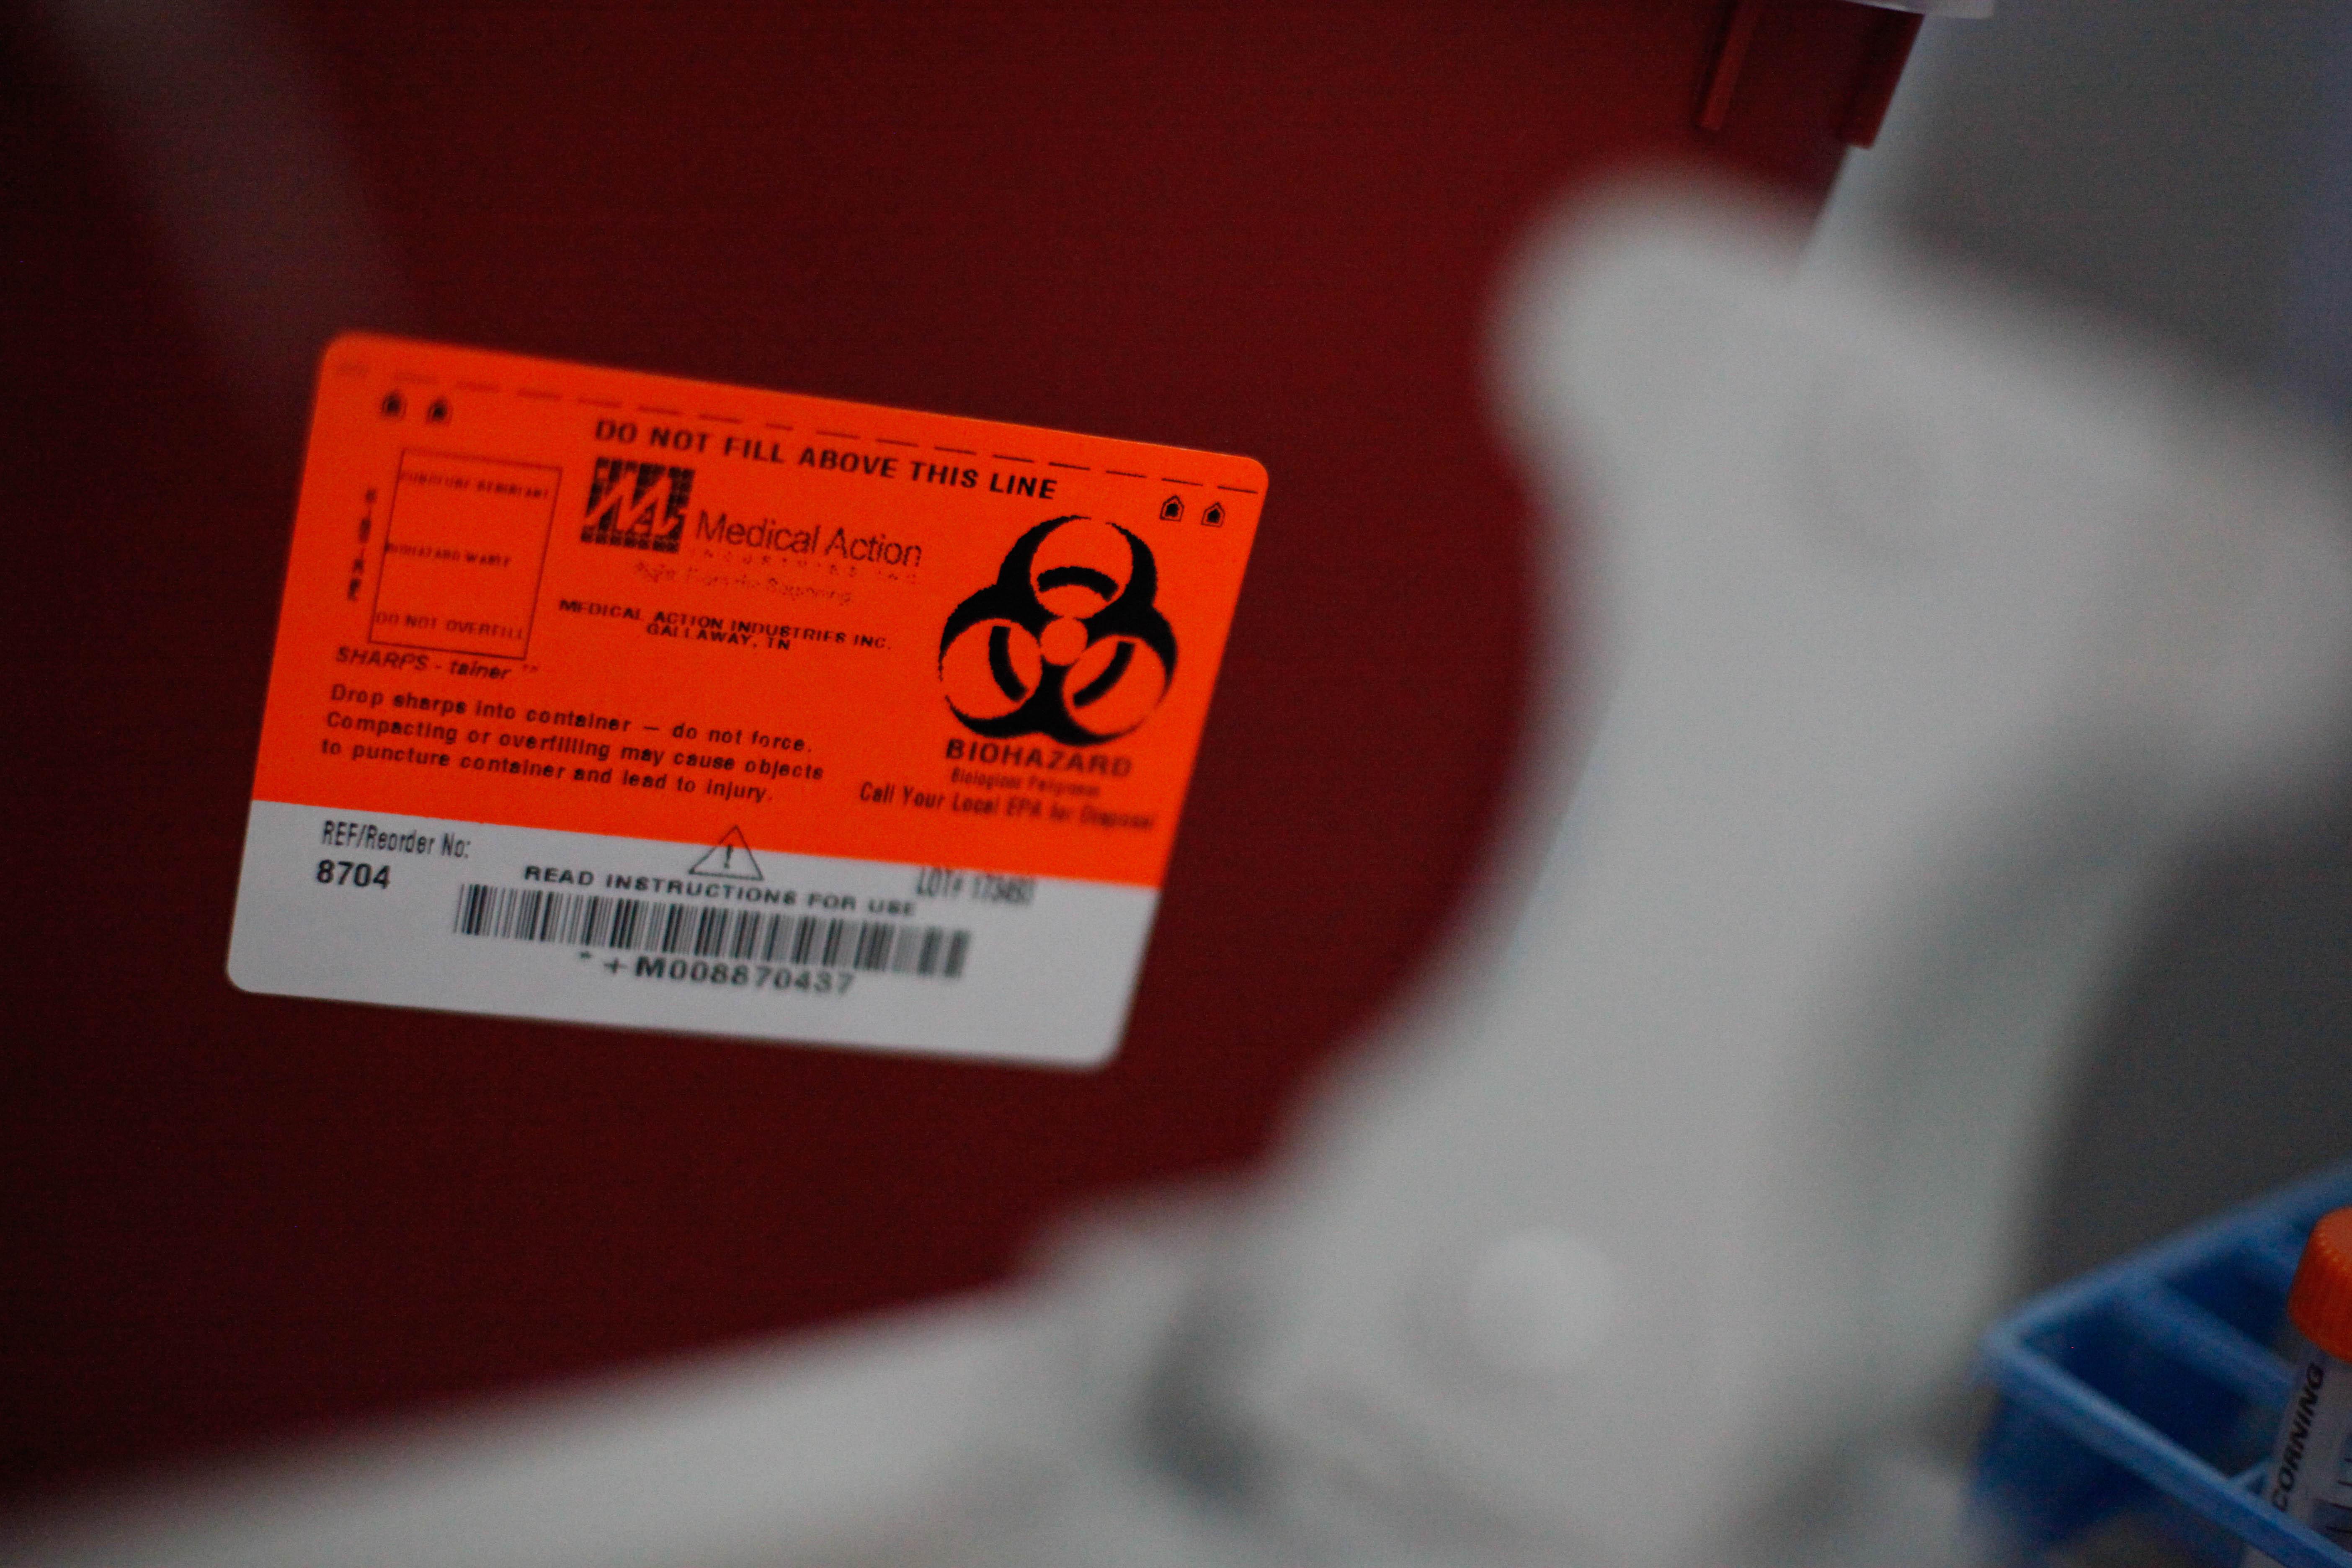 Biohazard Container